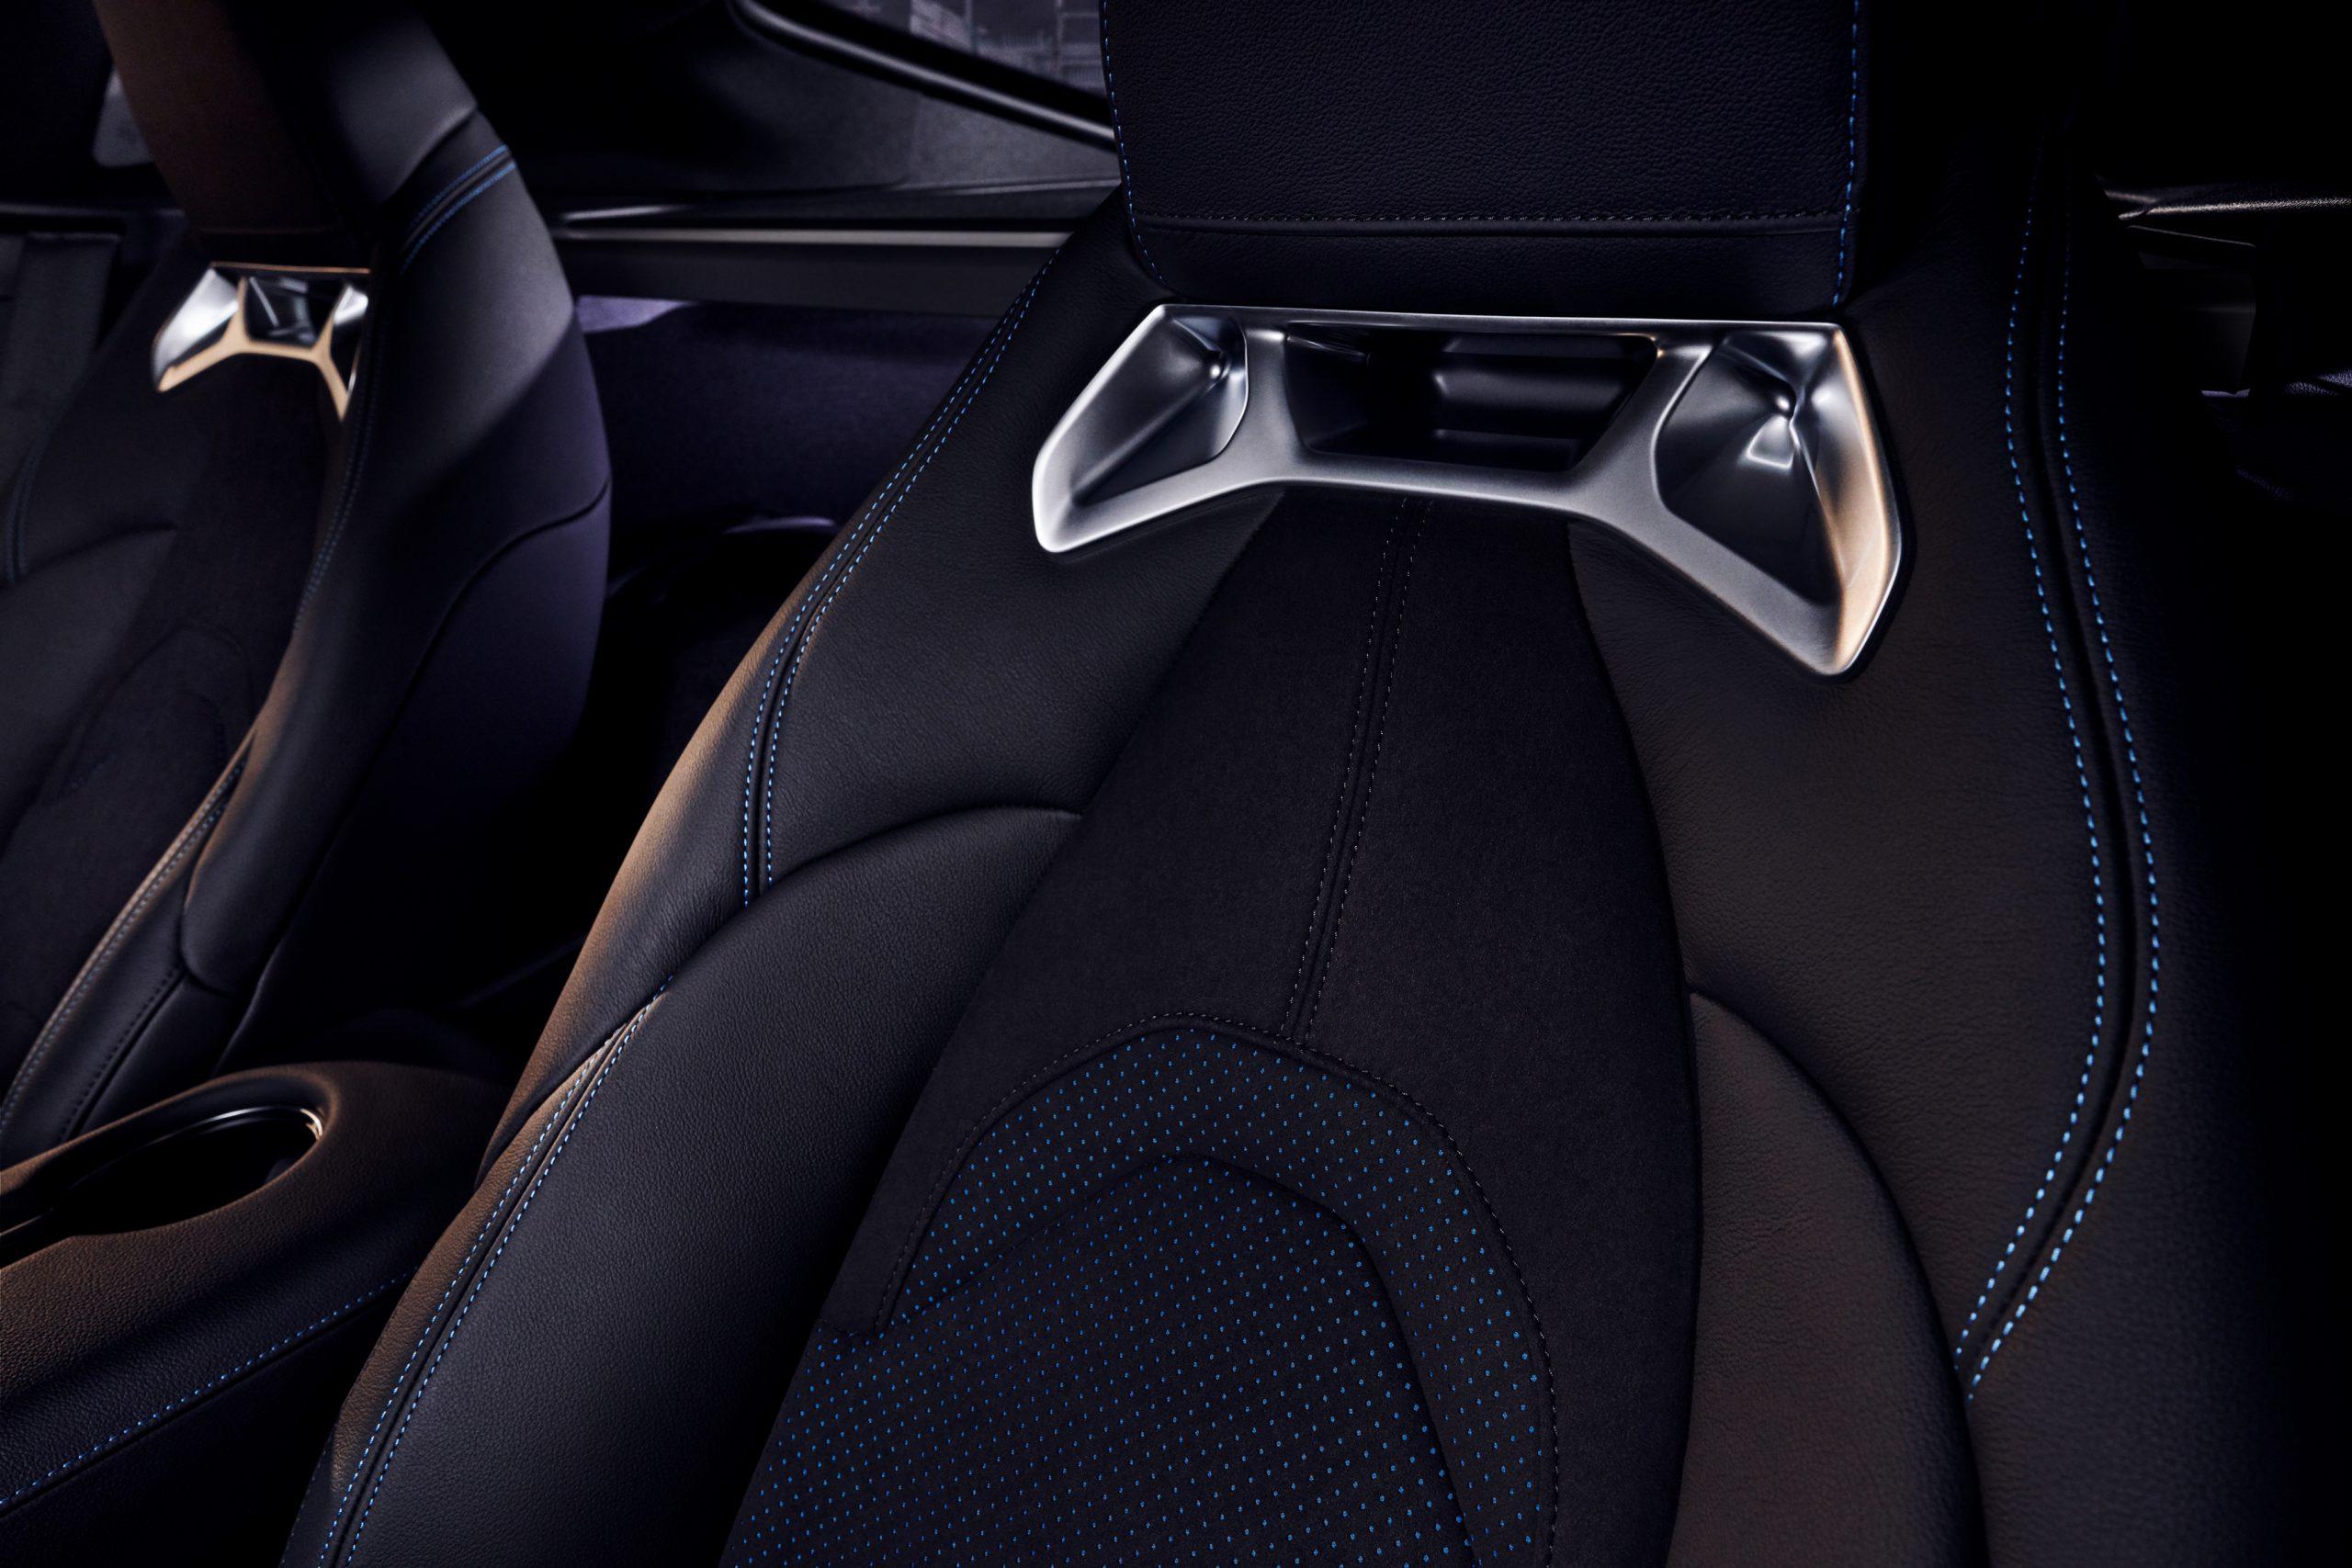 2021-GR-Supra-A91-Edition-Interior_001-scaled